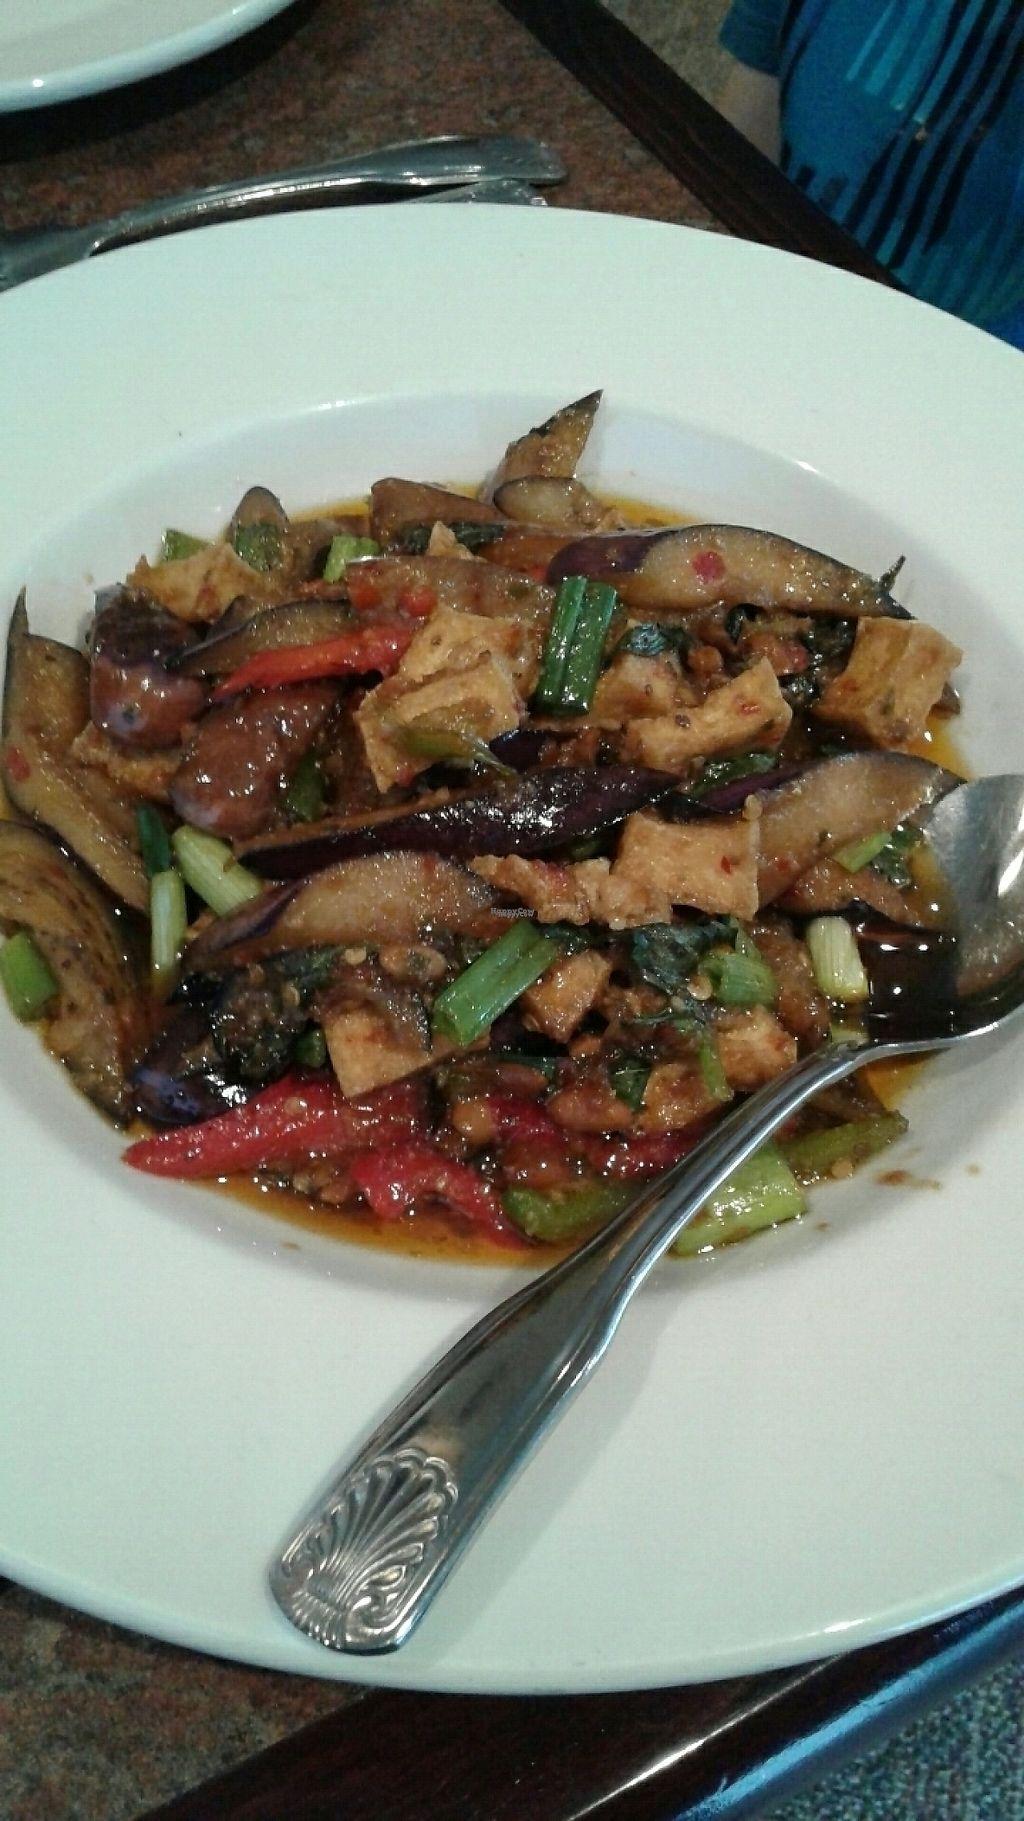 "Photo of Lemon Grass Thai Restaurant  by <a href=""/members/profile/JeffBlatnick"">JeffBlatnick</a> <br/>Pad Ka Pow - Egg plant with Bean sauce ????? <br/> April 8, 2017  - <a href='/contact/abuse/image/33005/245612'>Report</a>"